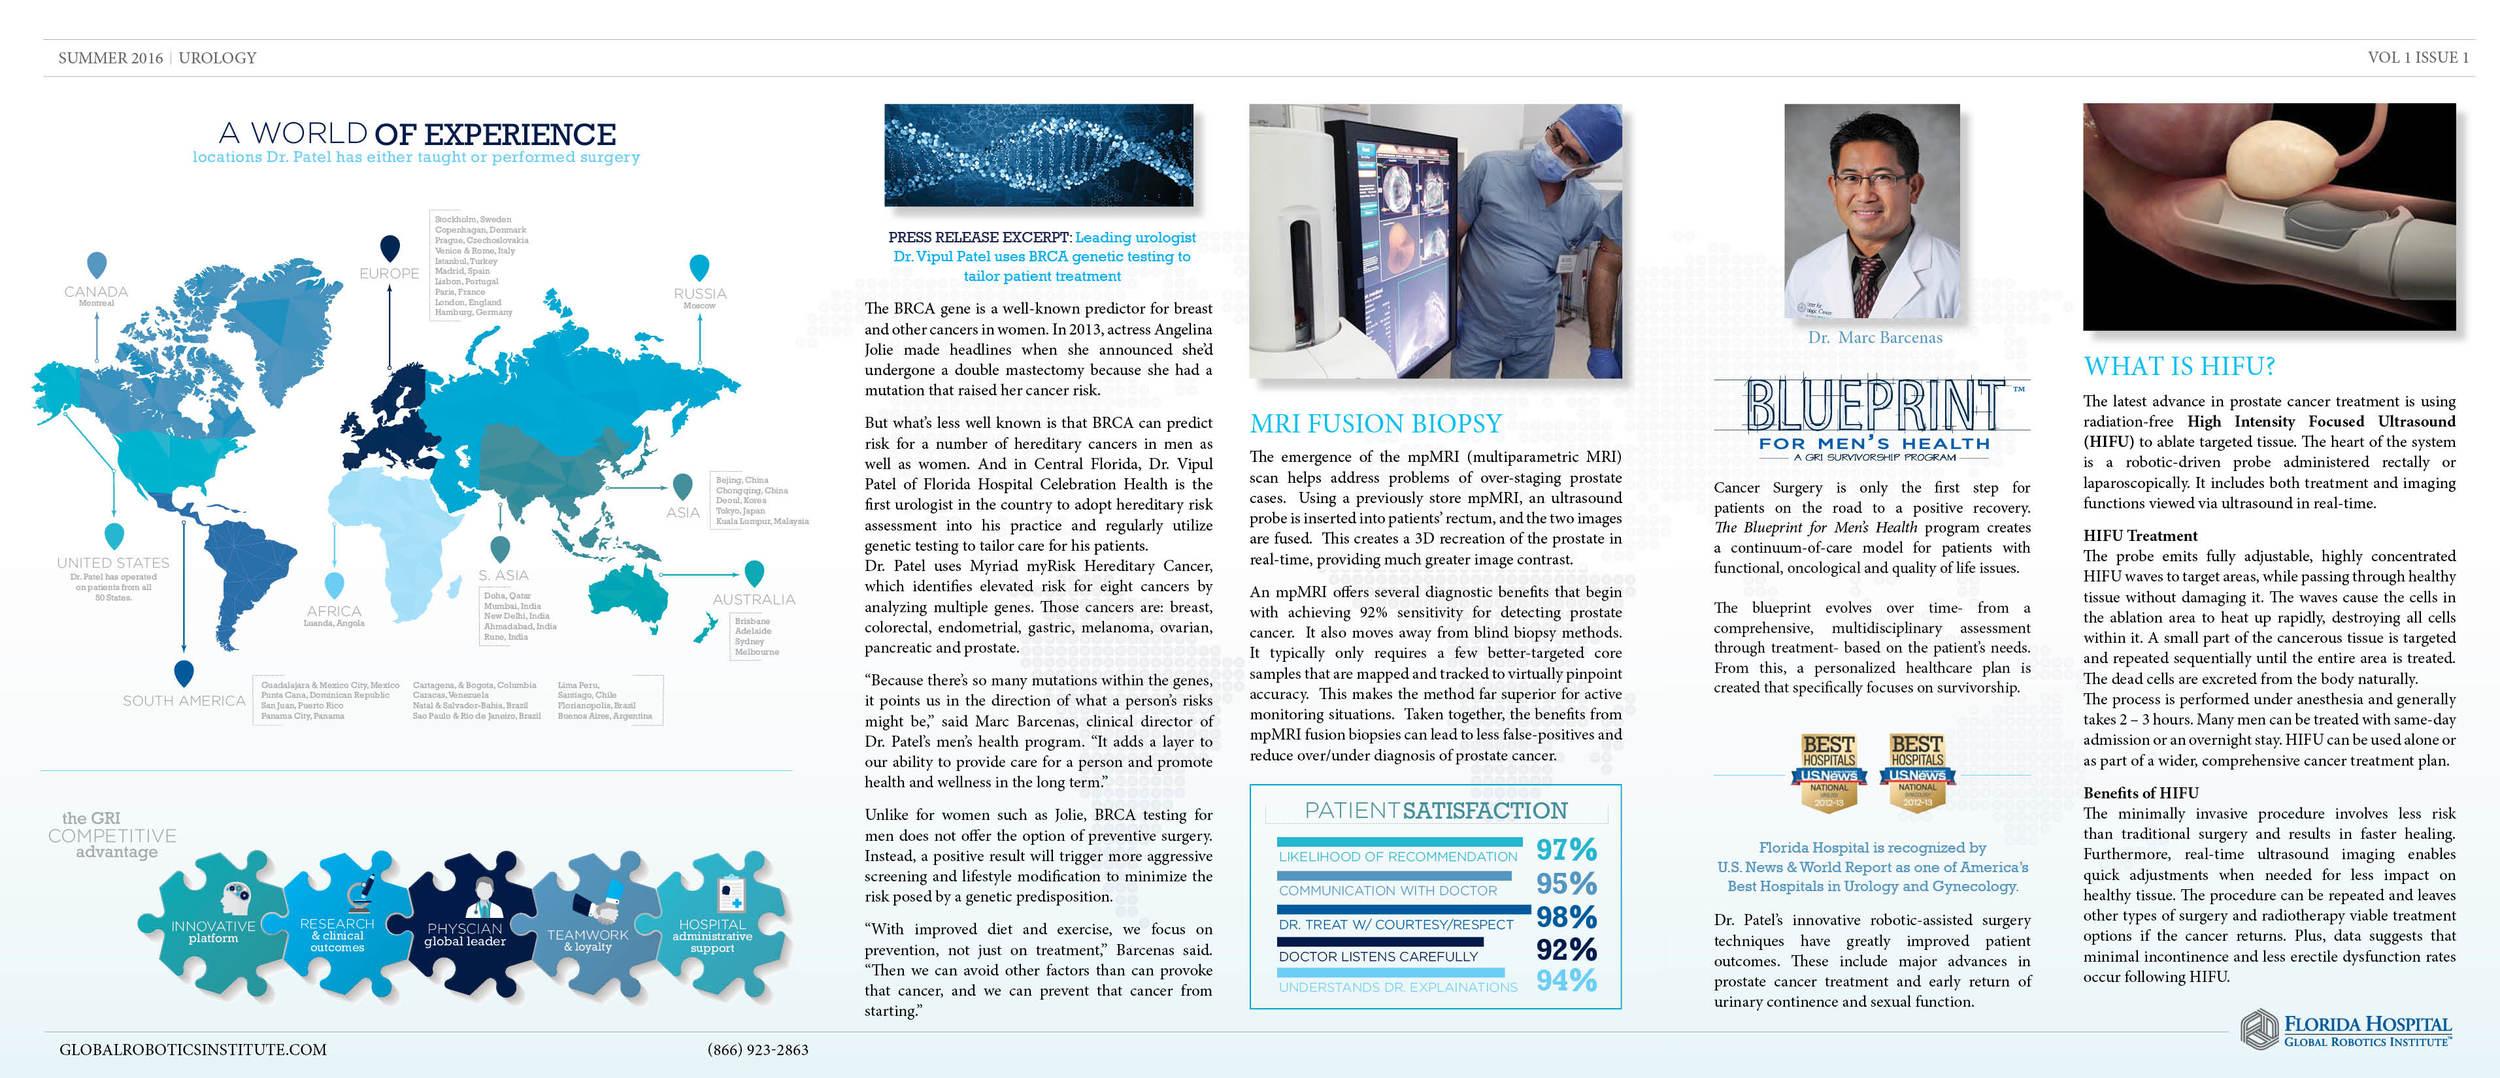 GRI-594 Newsletter Design Concept Spreads.jpg